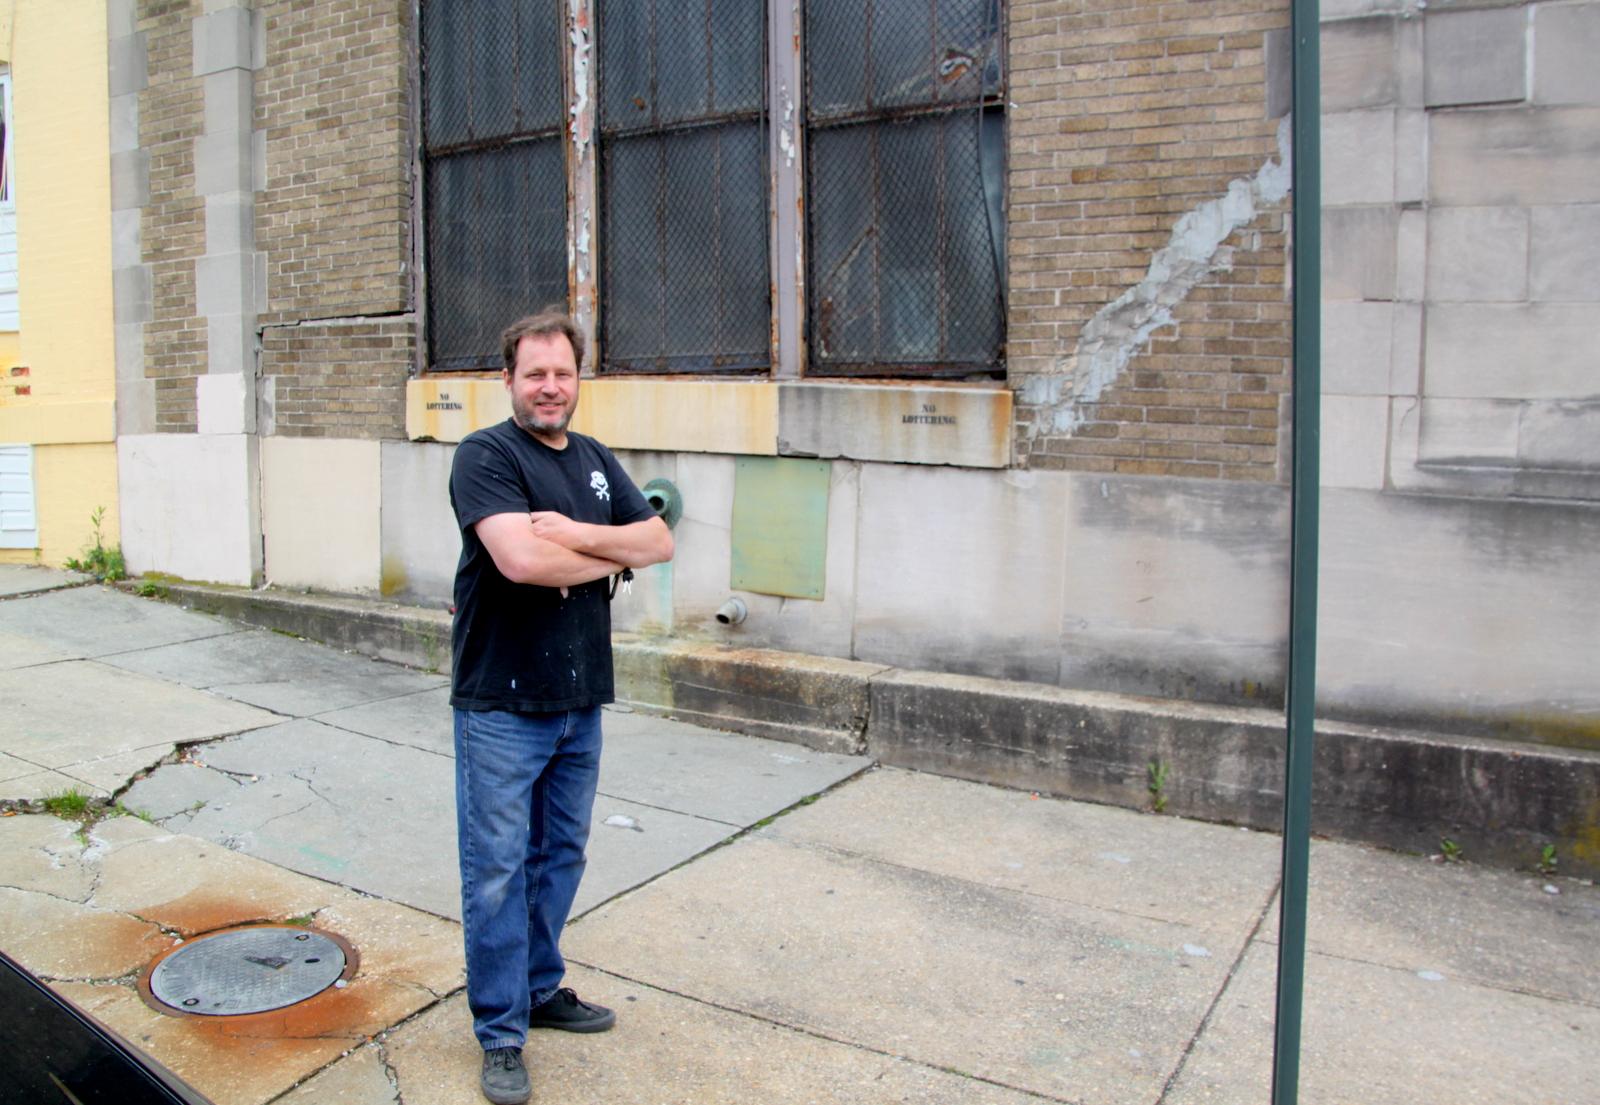 Joe Clancy has watched cracks appear in sidewalk and walls at 439 East Preston Street. (Fern Shen)